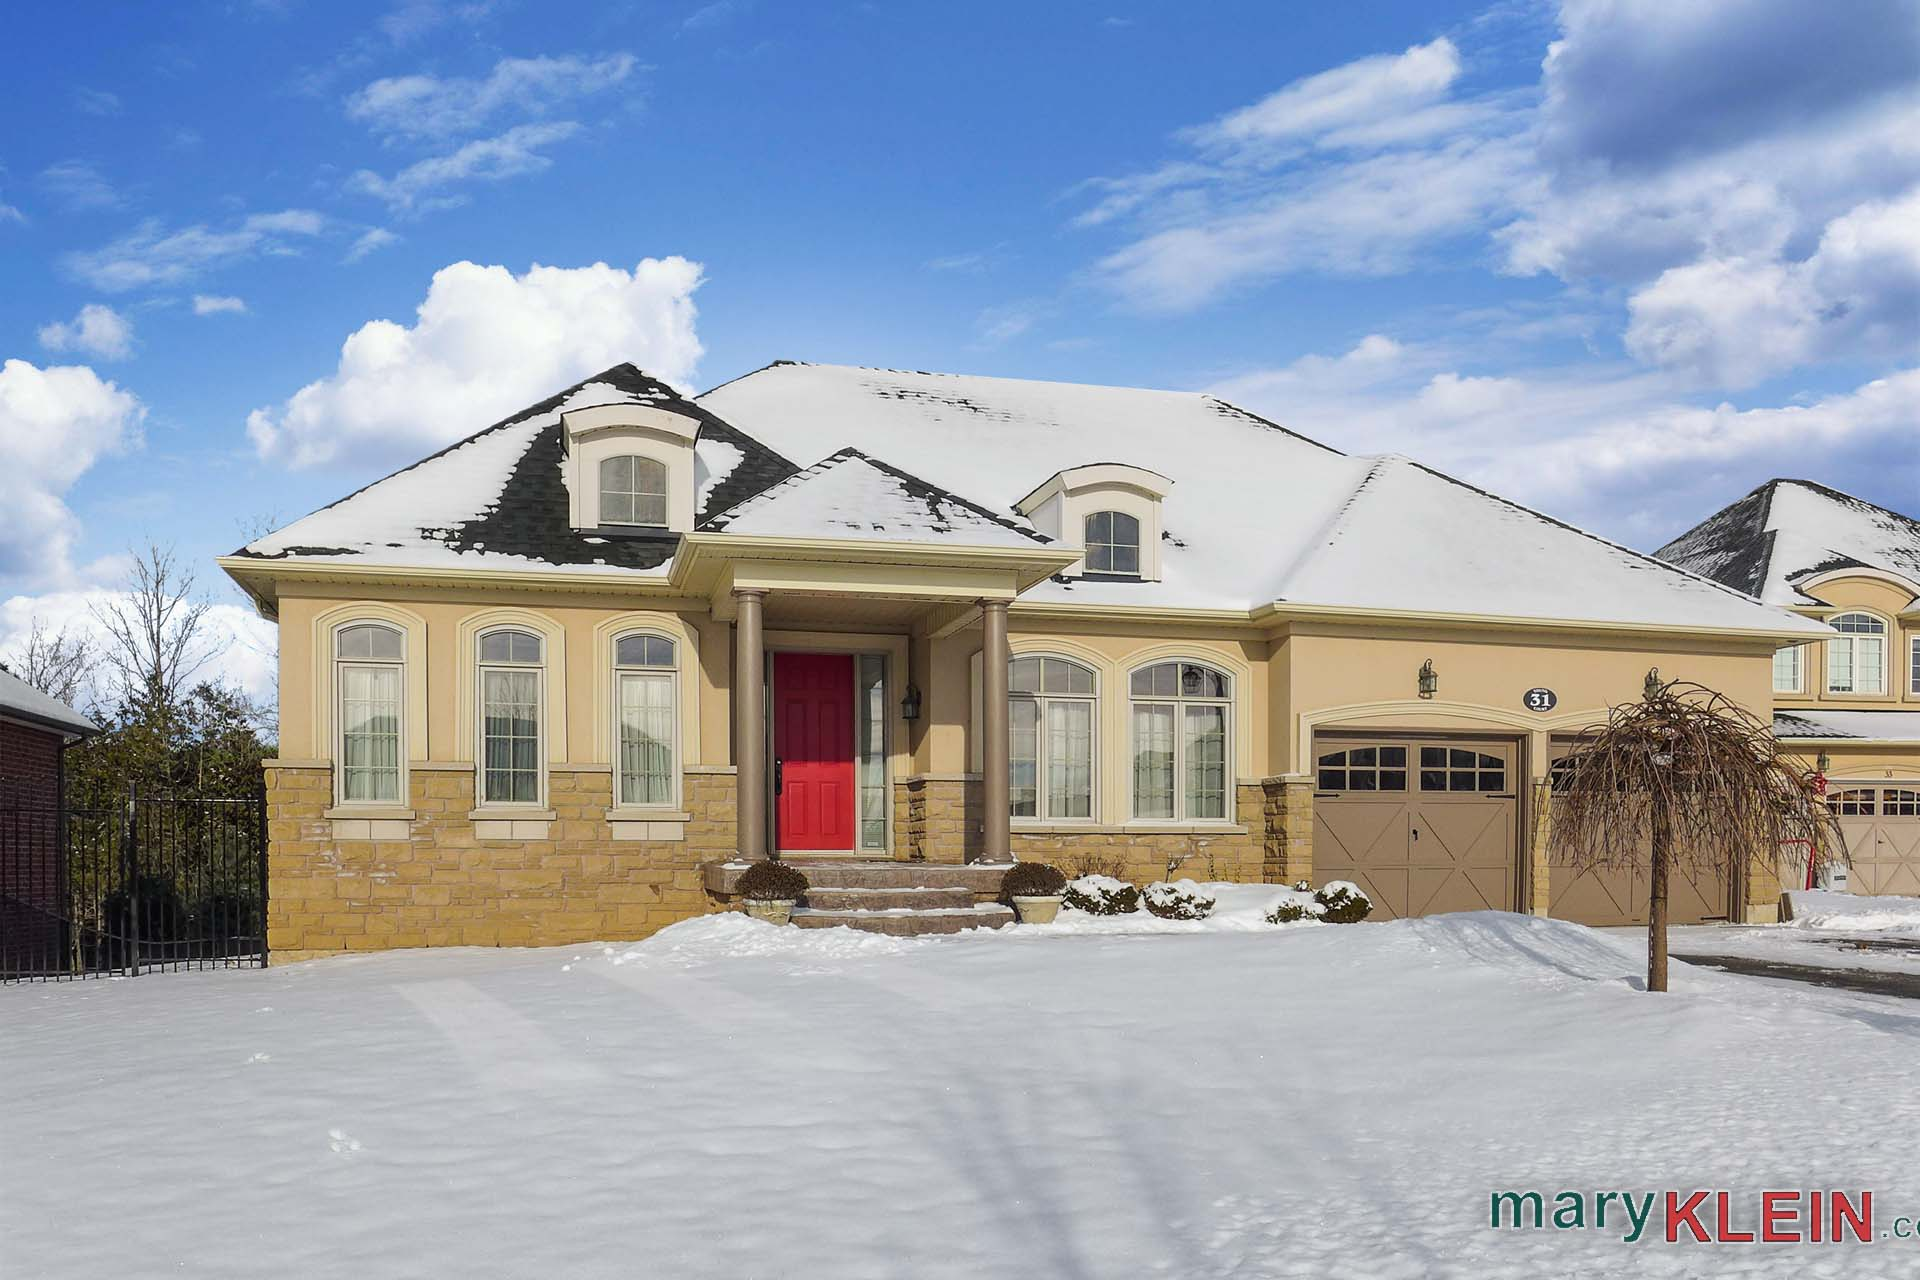 31 Young Court, Orangeville, Home For Sale, Mary Klein, Kait Klein